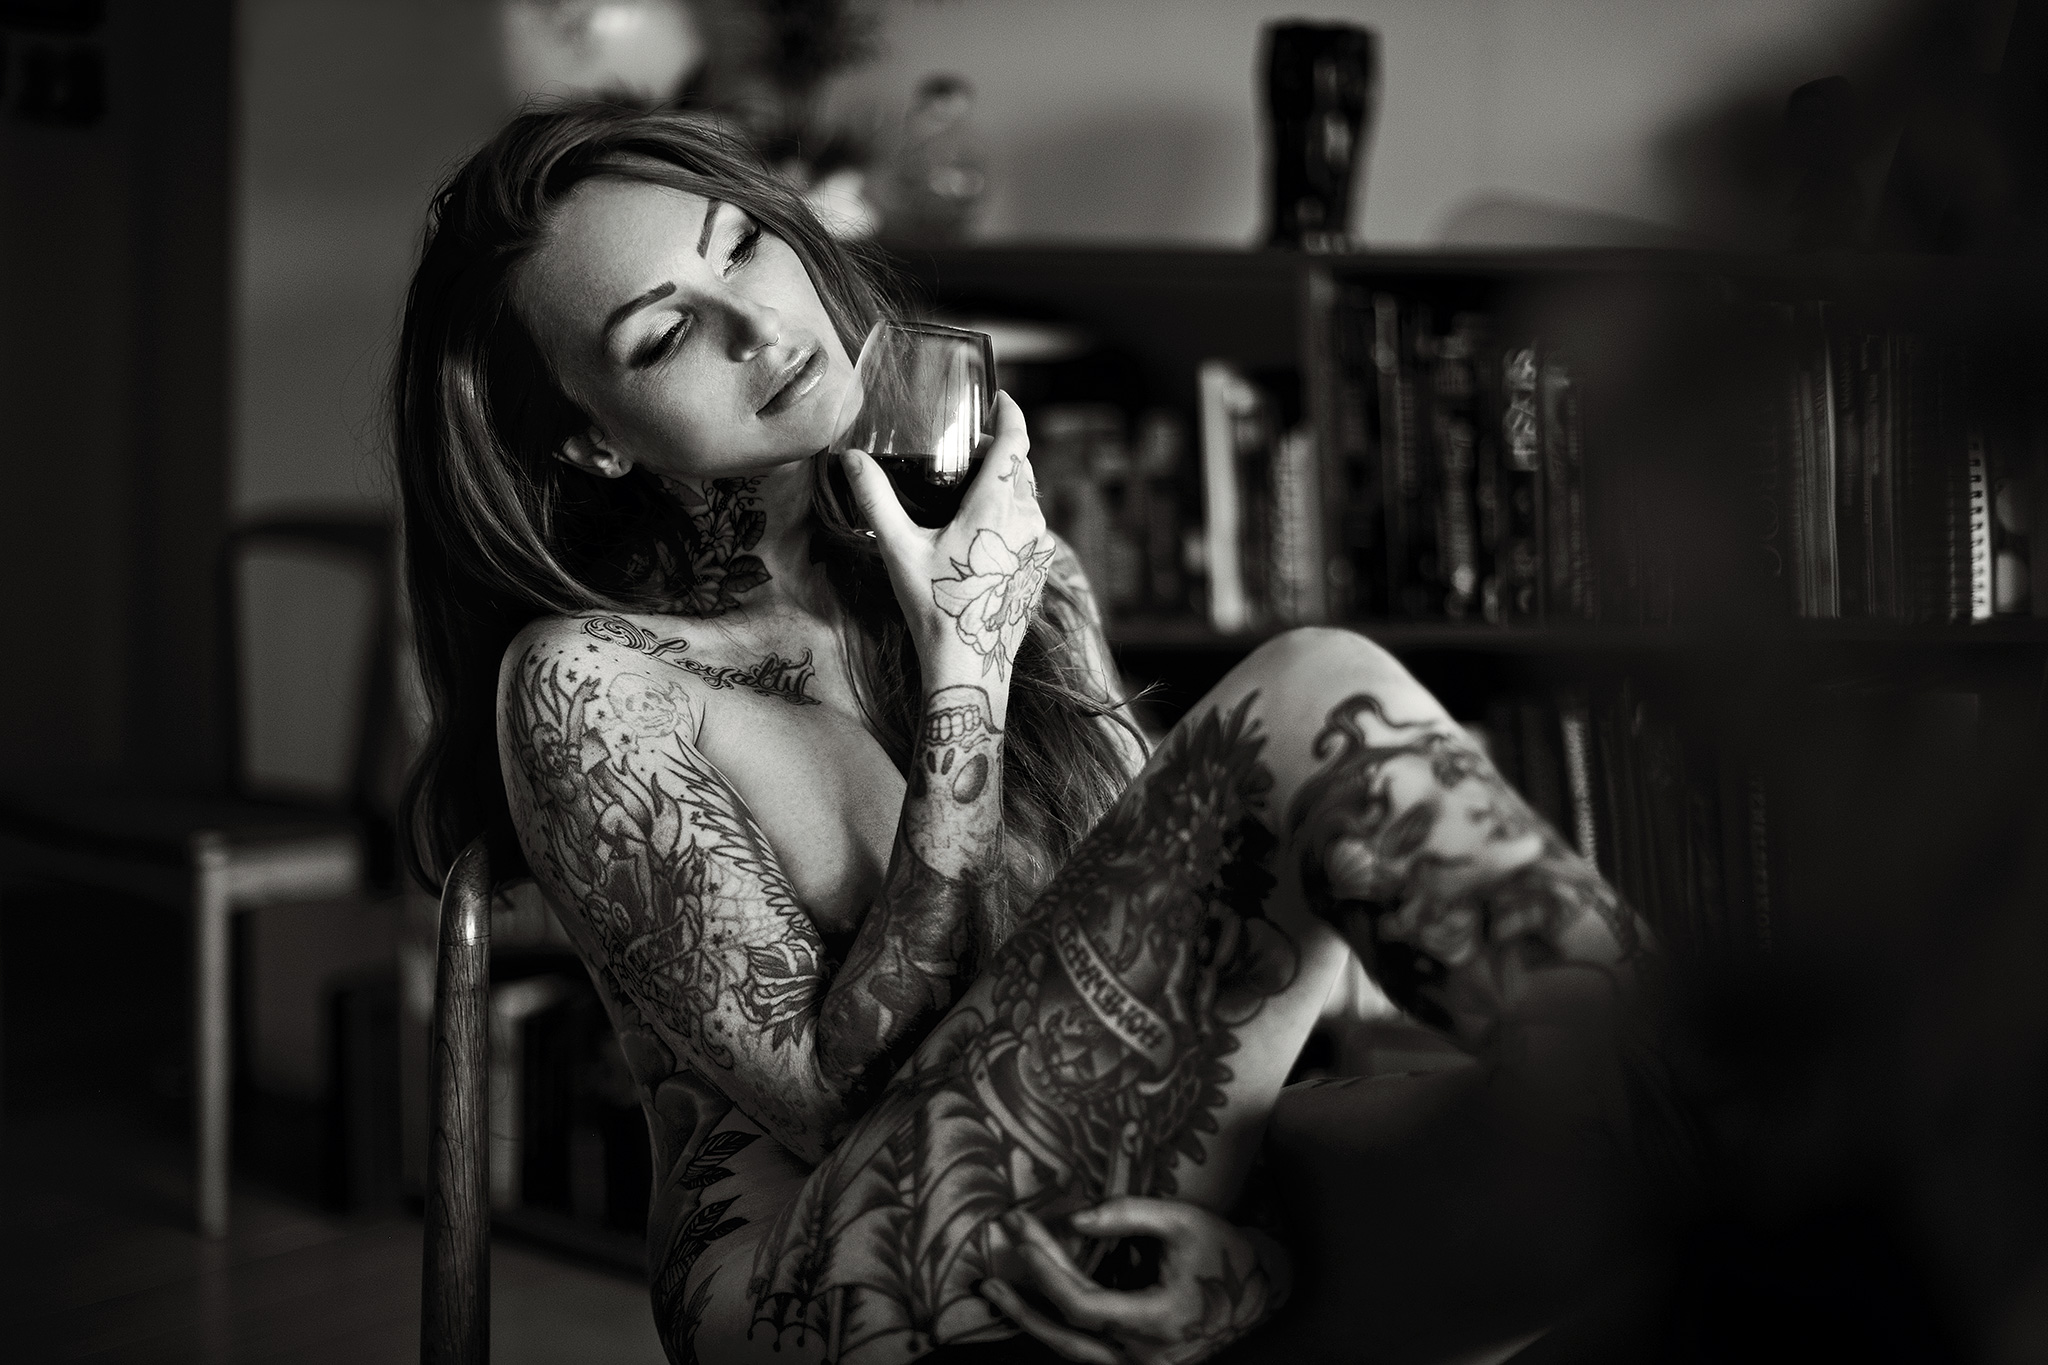 Mikkel_Laumann_Photography_Anne_Lindfjeld_Reroute_To_Remain_Photoshoot_Magazine_02.jpg